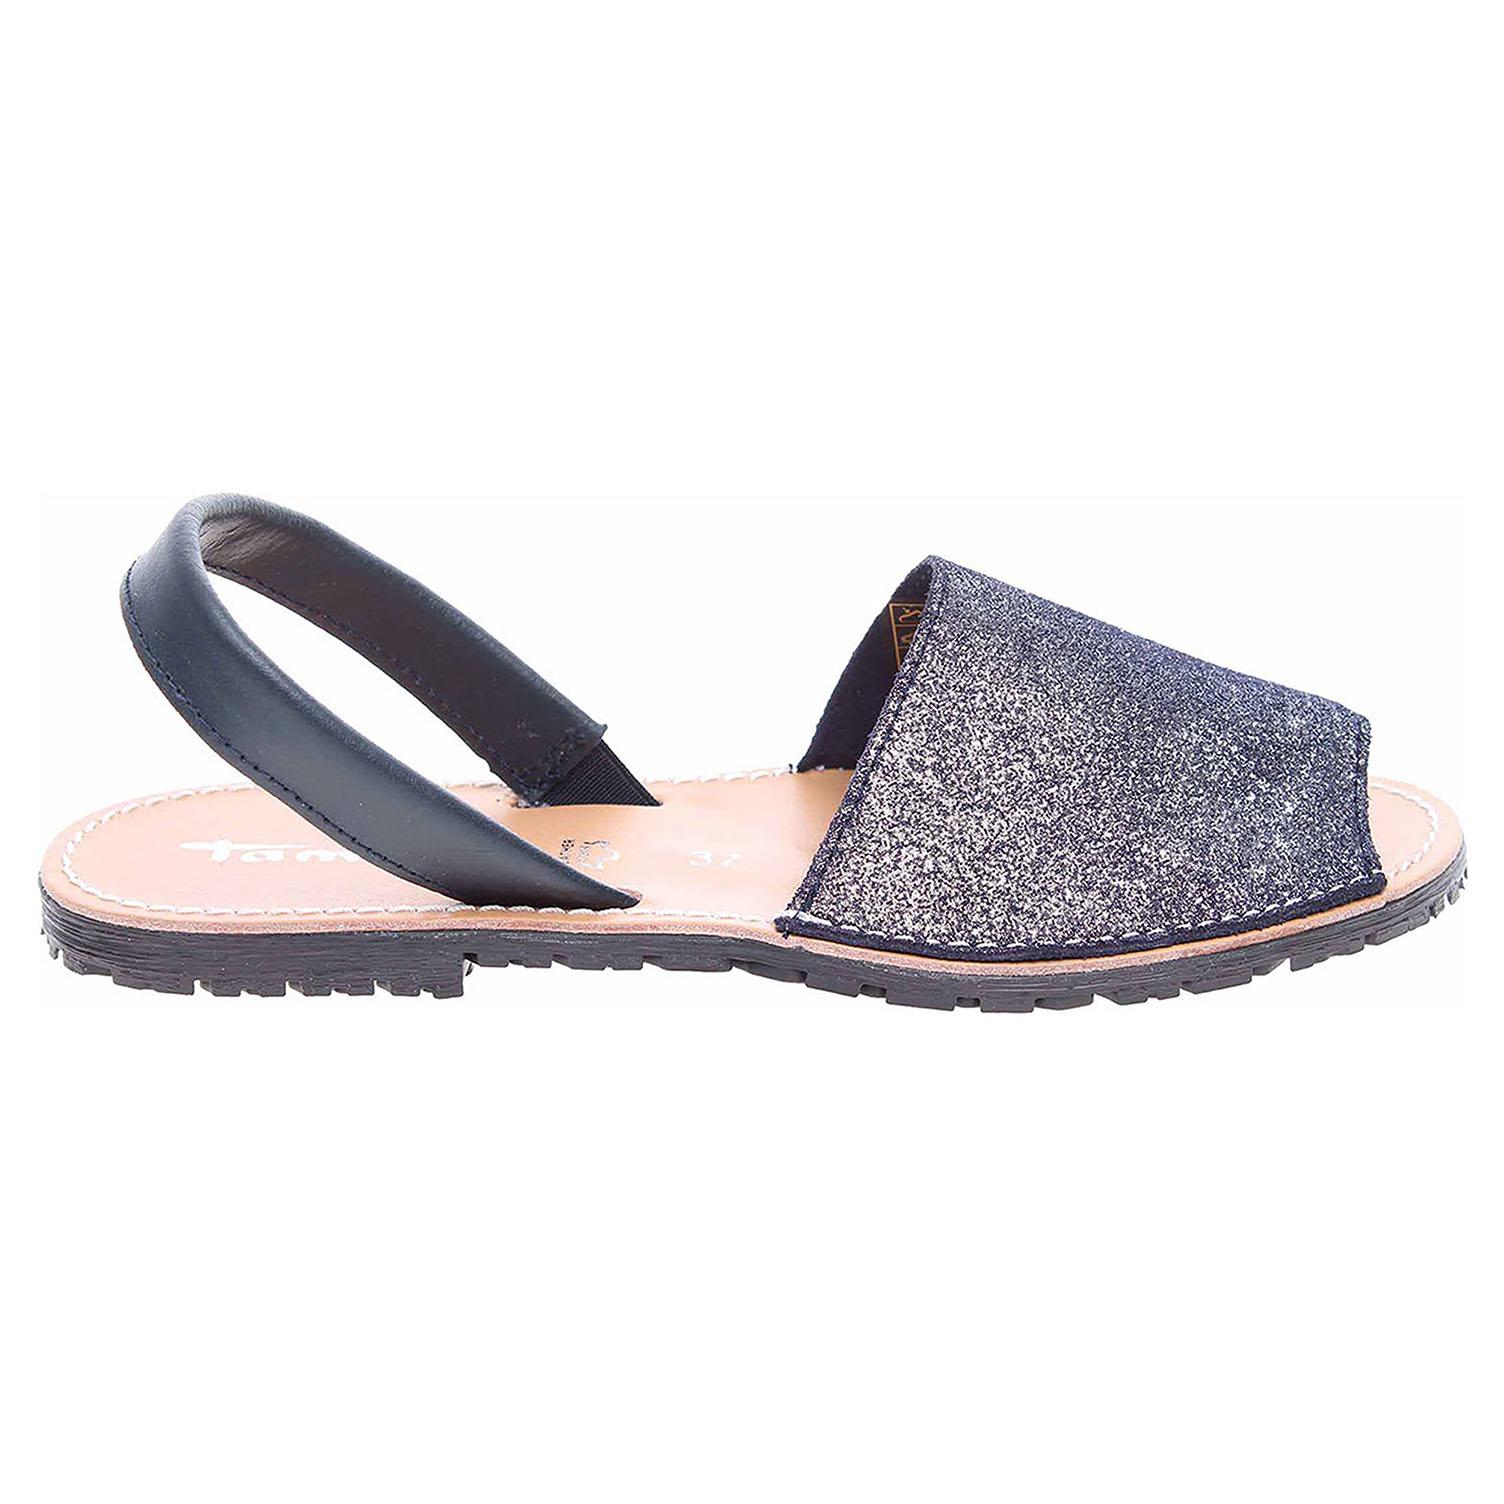 Ecco Tamaris dámské sandály 1-28916-30 navy glam 23801234 ae842b4aff